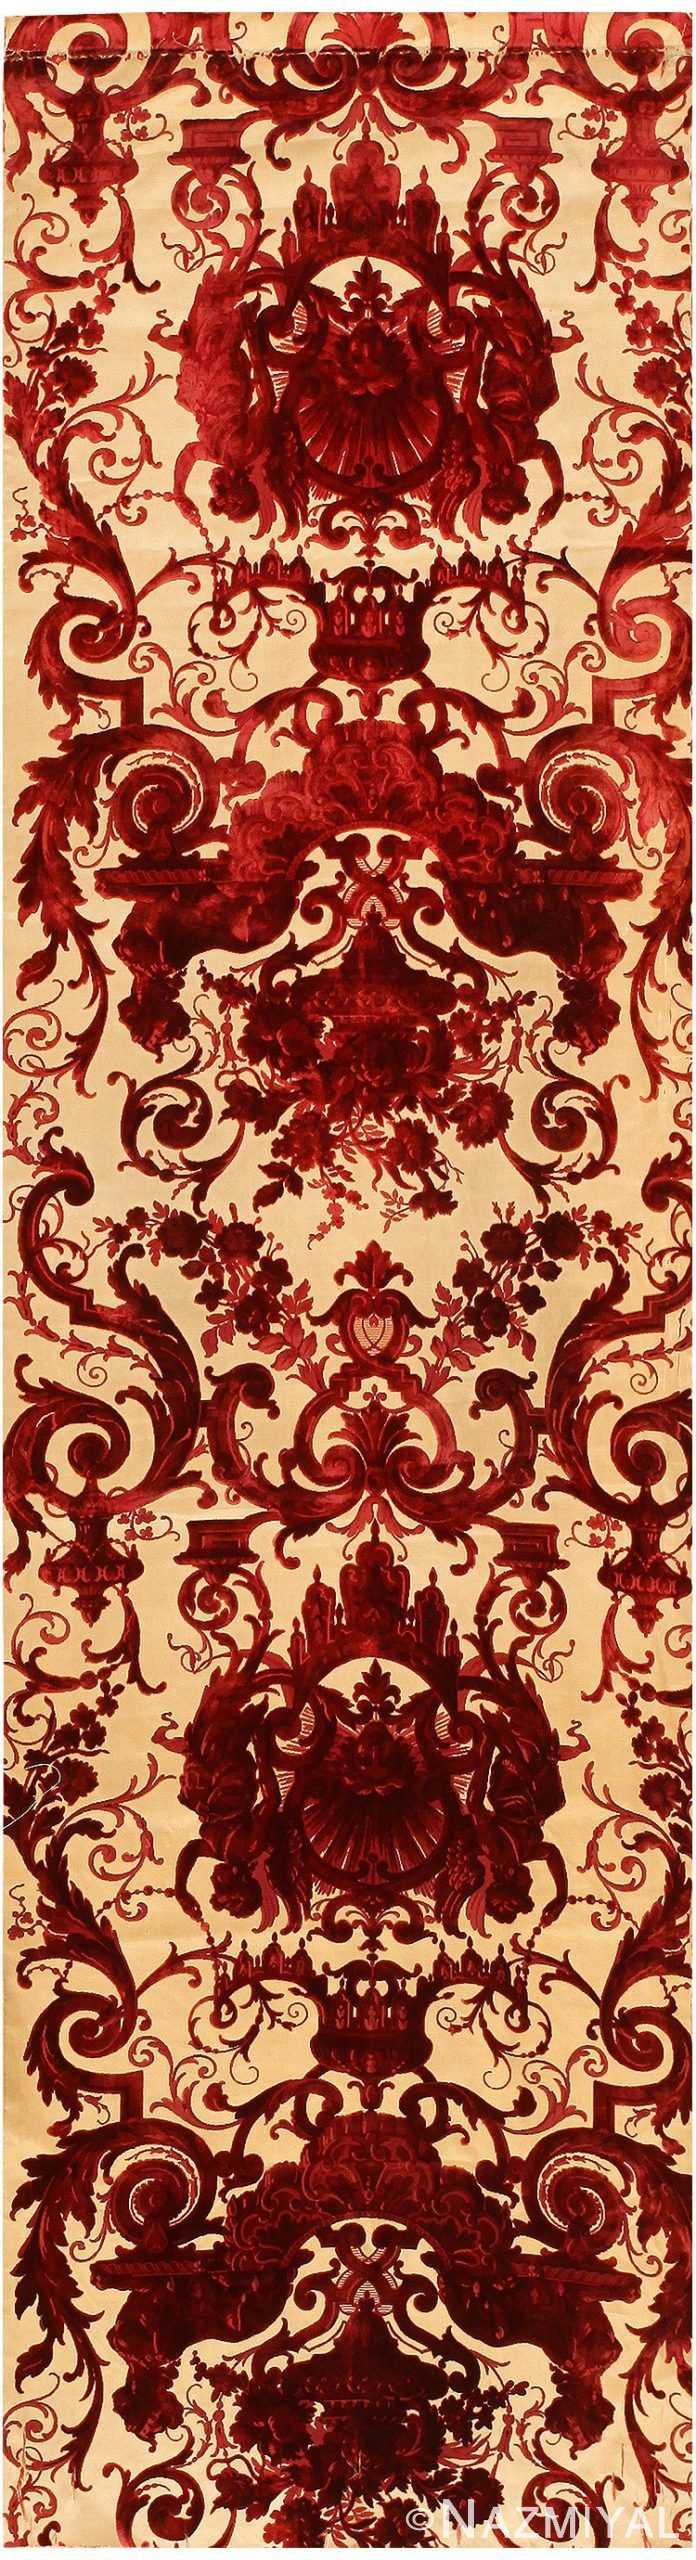 Antique Silk Velvet Textile from India 41491 Nazmiyal